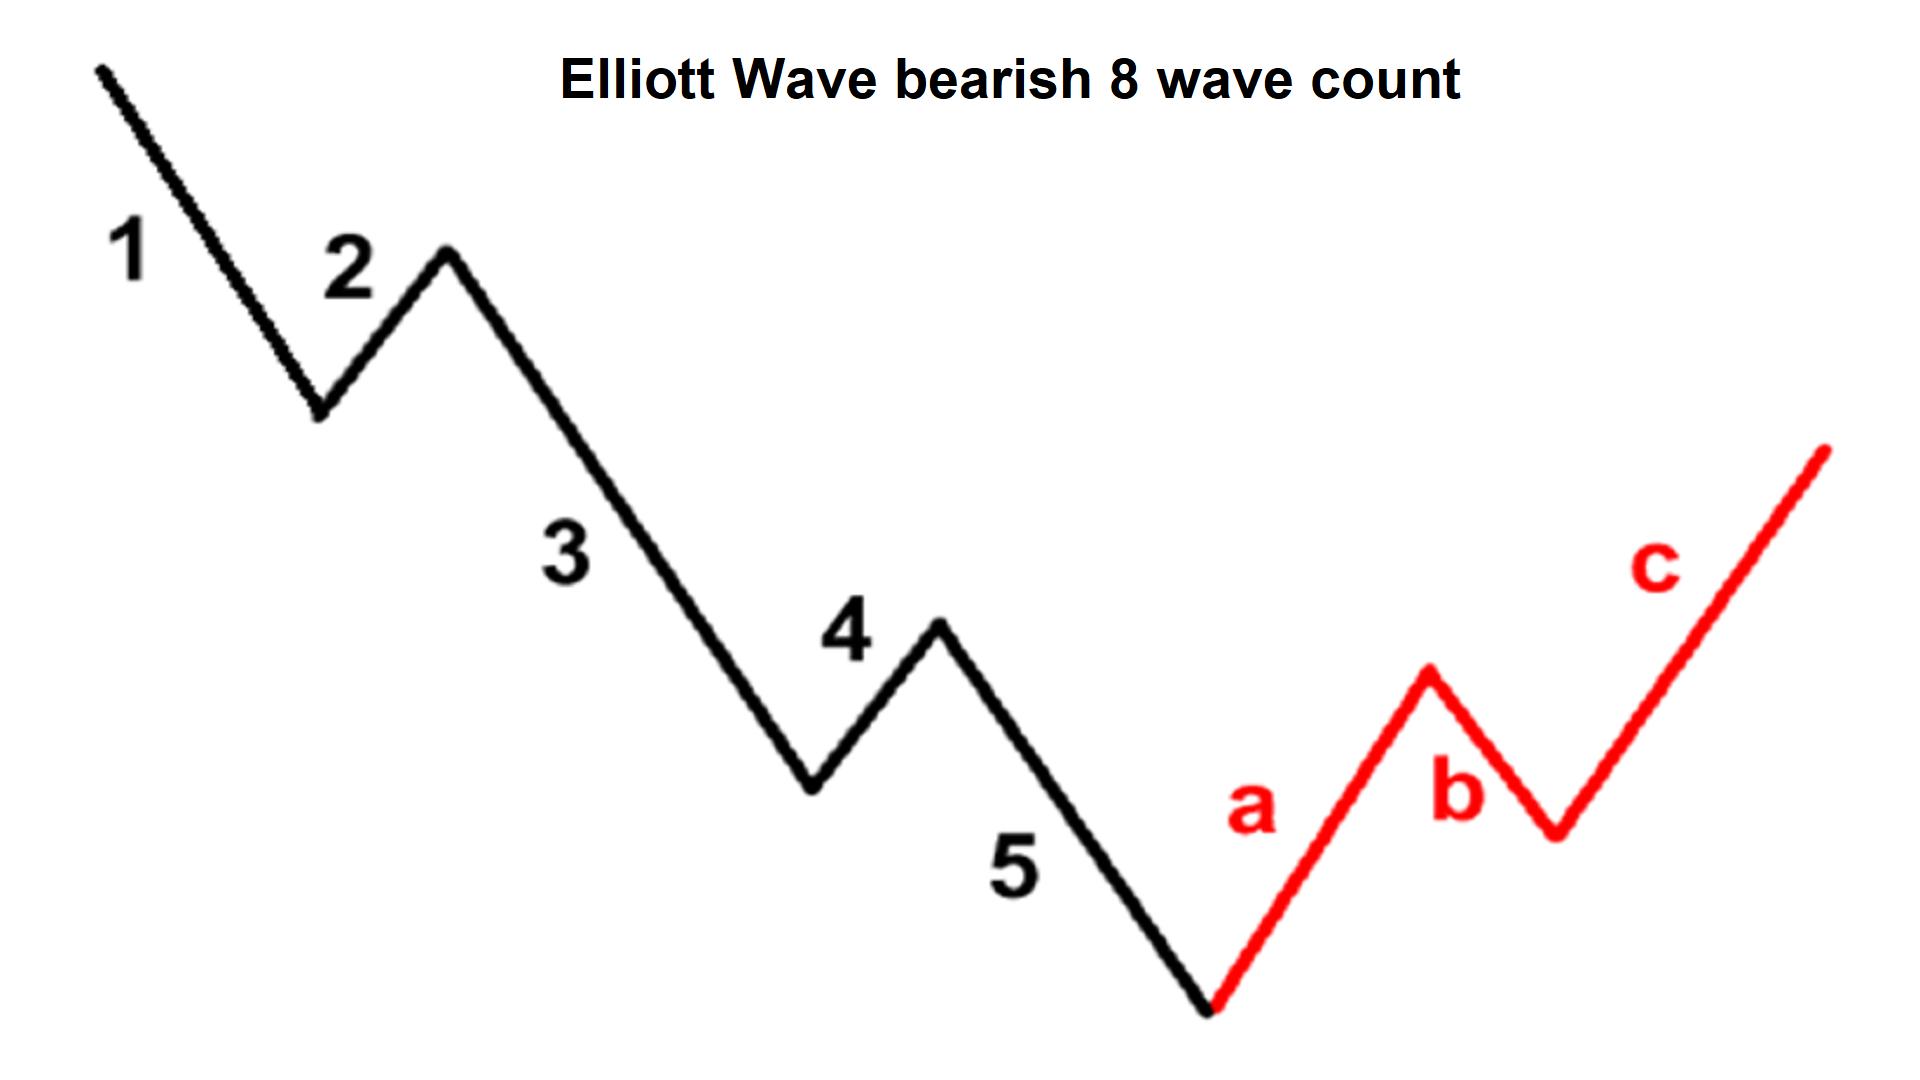 EW Bear count